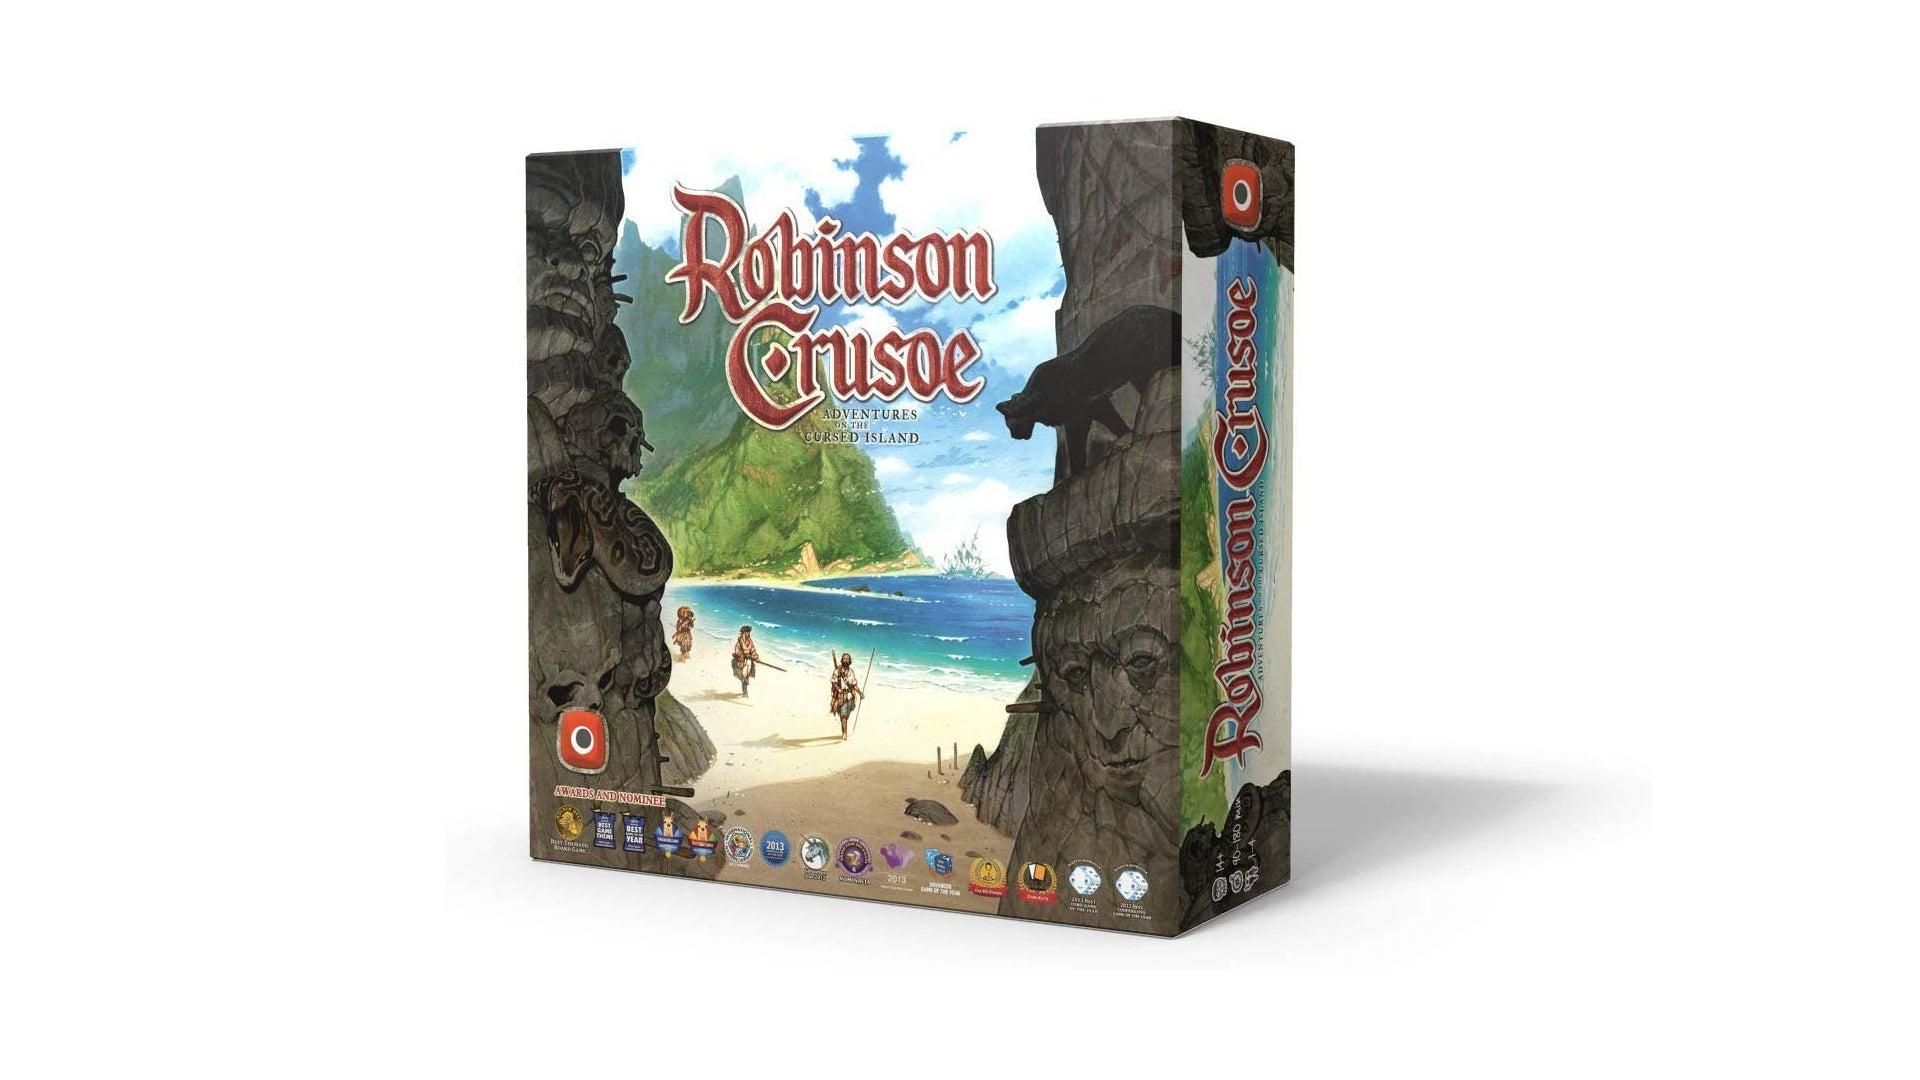 Robinson Crusoe: Adventures on the Cursed Island co-op board game box